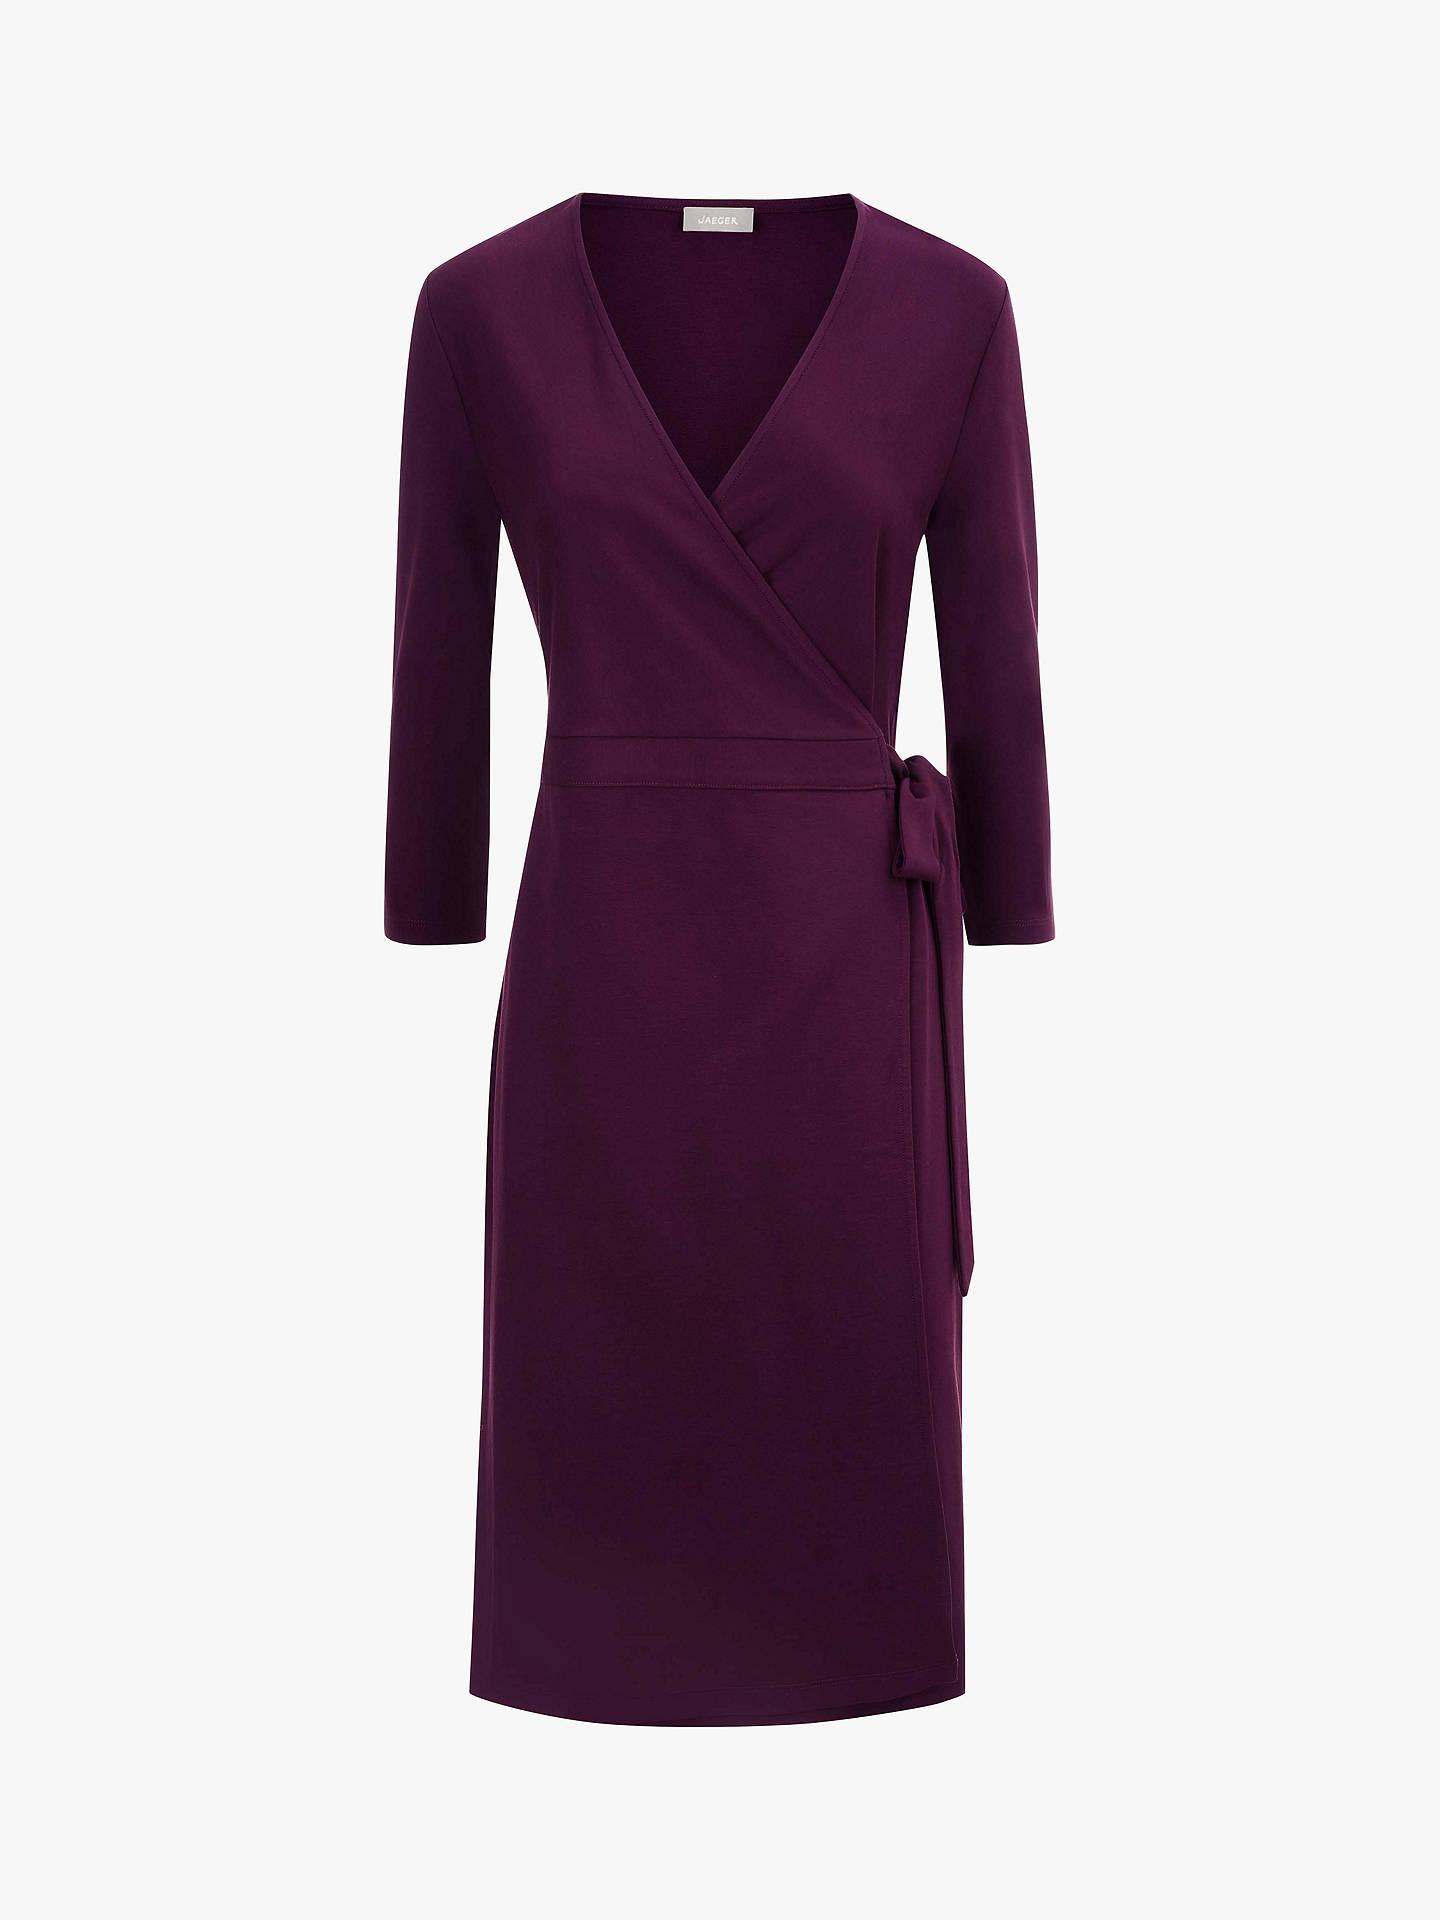 7bfef90c45 ... Buy Jaeger Jersey Wrap Dress